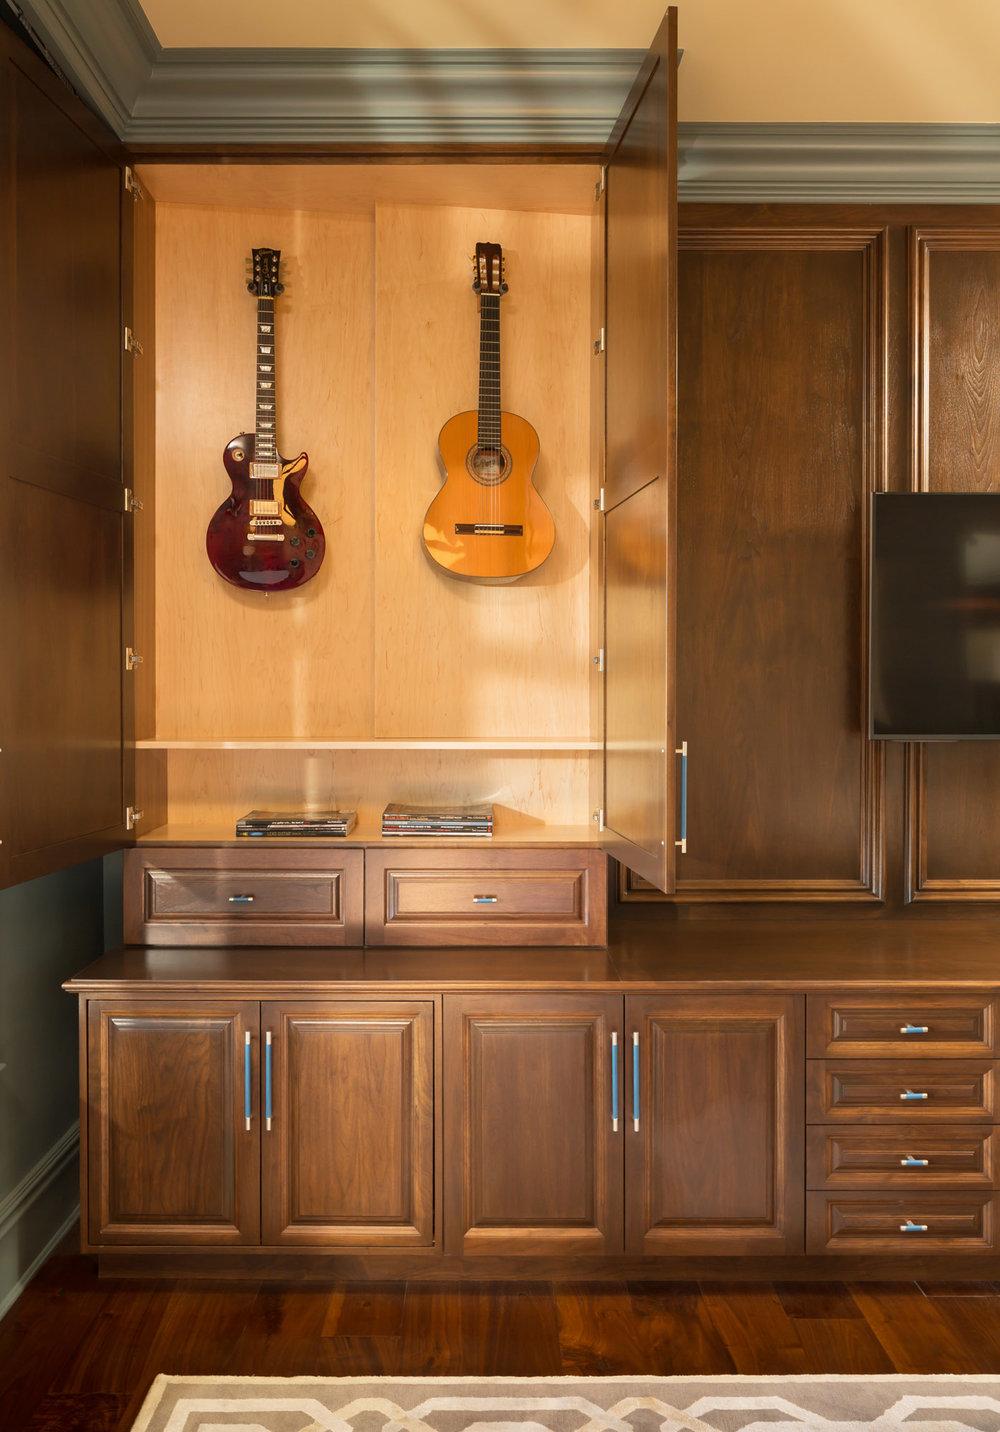 office_cabinet_vignette-4569a_original.jpg